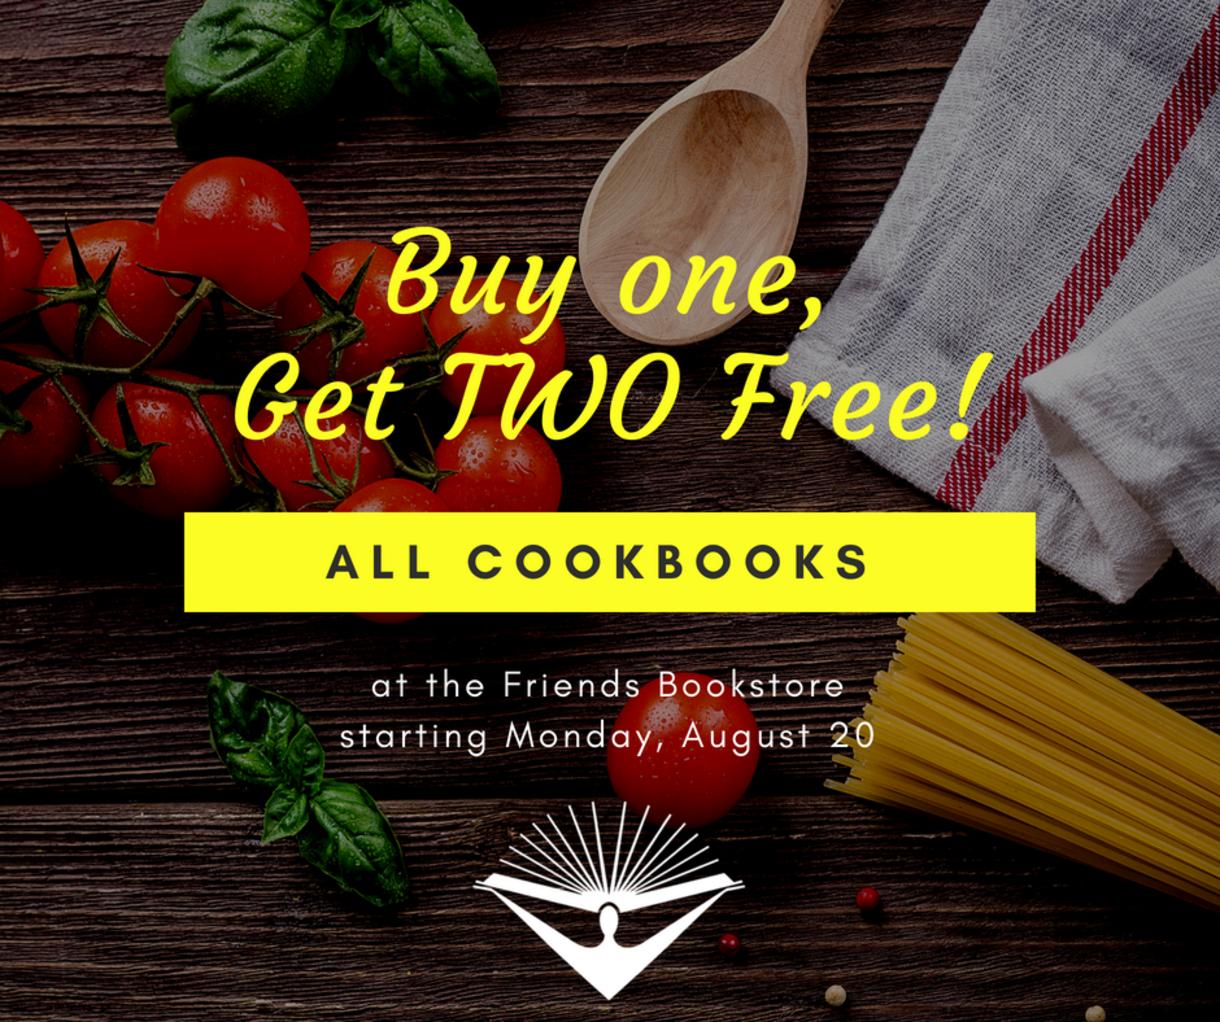 Friends Bookstore Cookbooks Sale